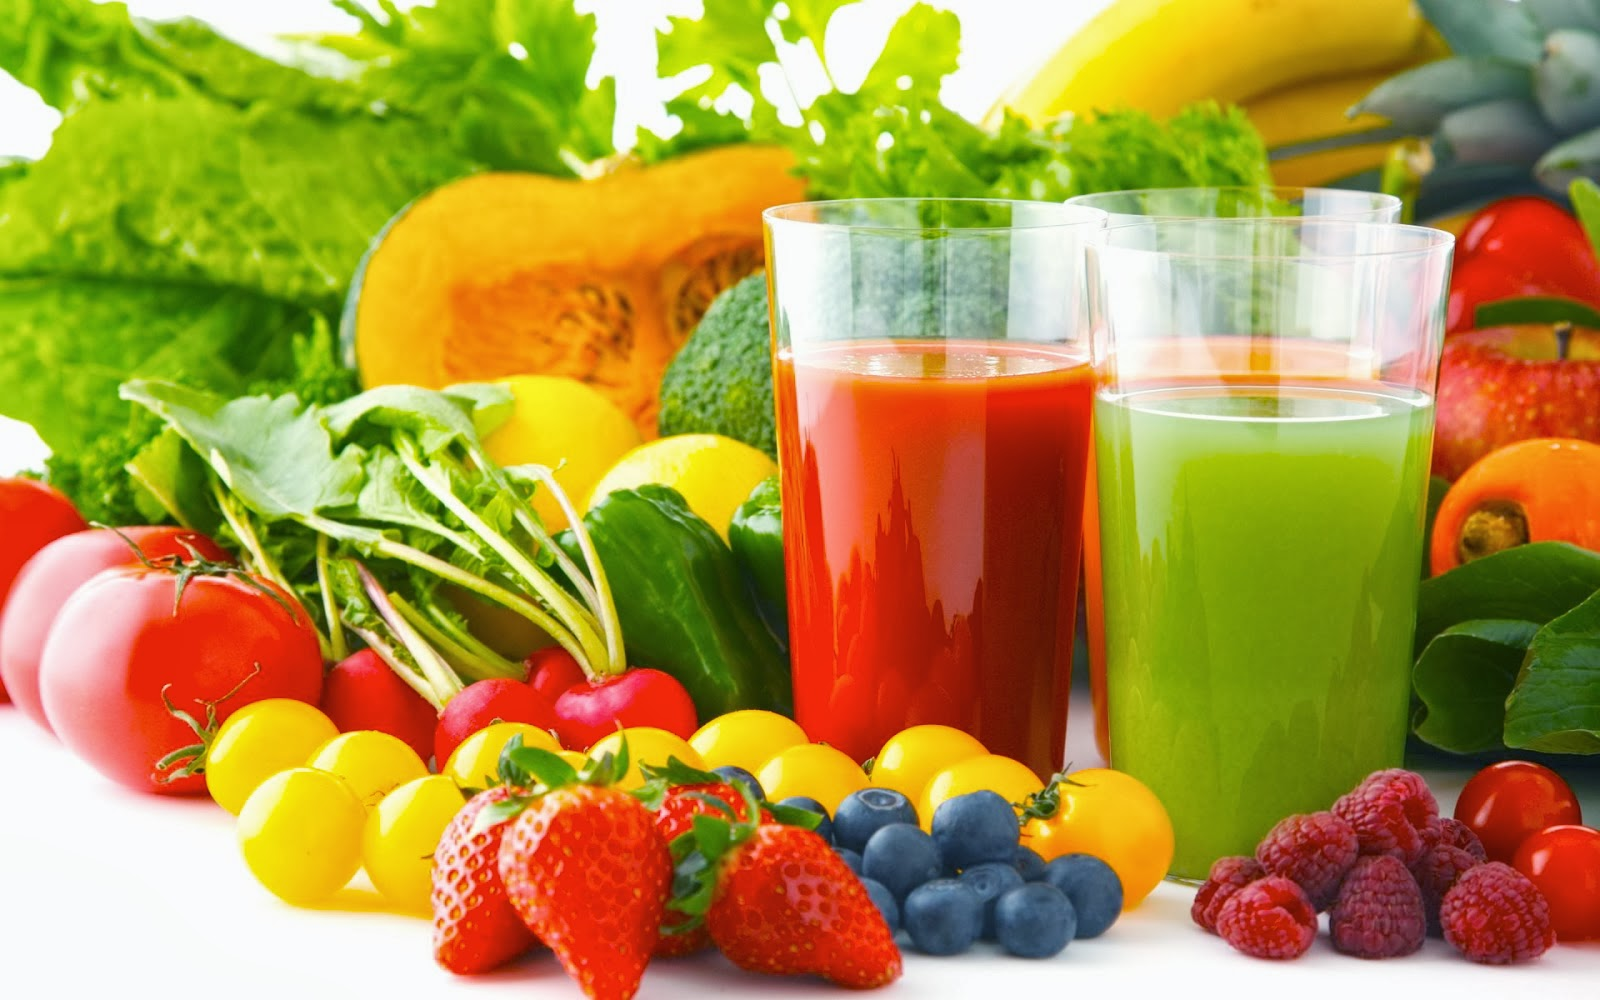 http://1.bp.blogspot.com/-ScHRW08QZxk/UoecOmx3yAI/AAAAAAAAAB8/8gIcib0IL90/s1600/jw199-350a-fresh-vegetable-juice_1920x1200_59997.jpg